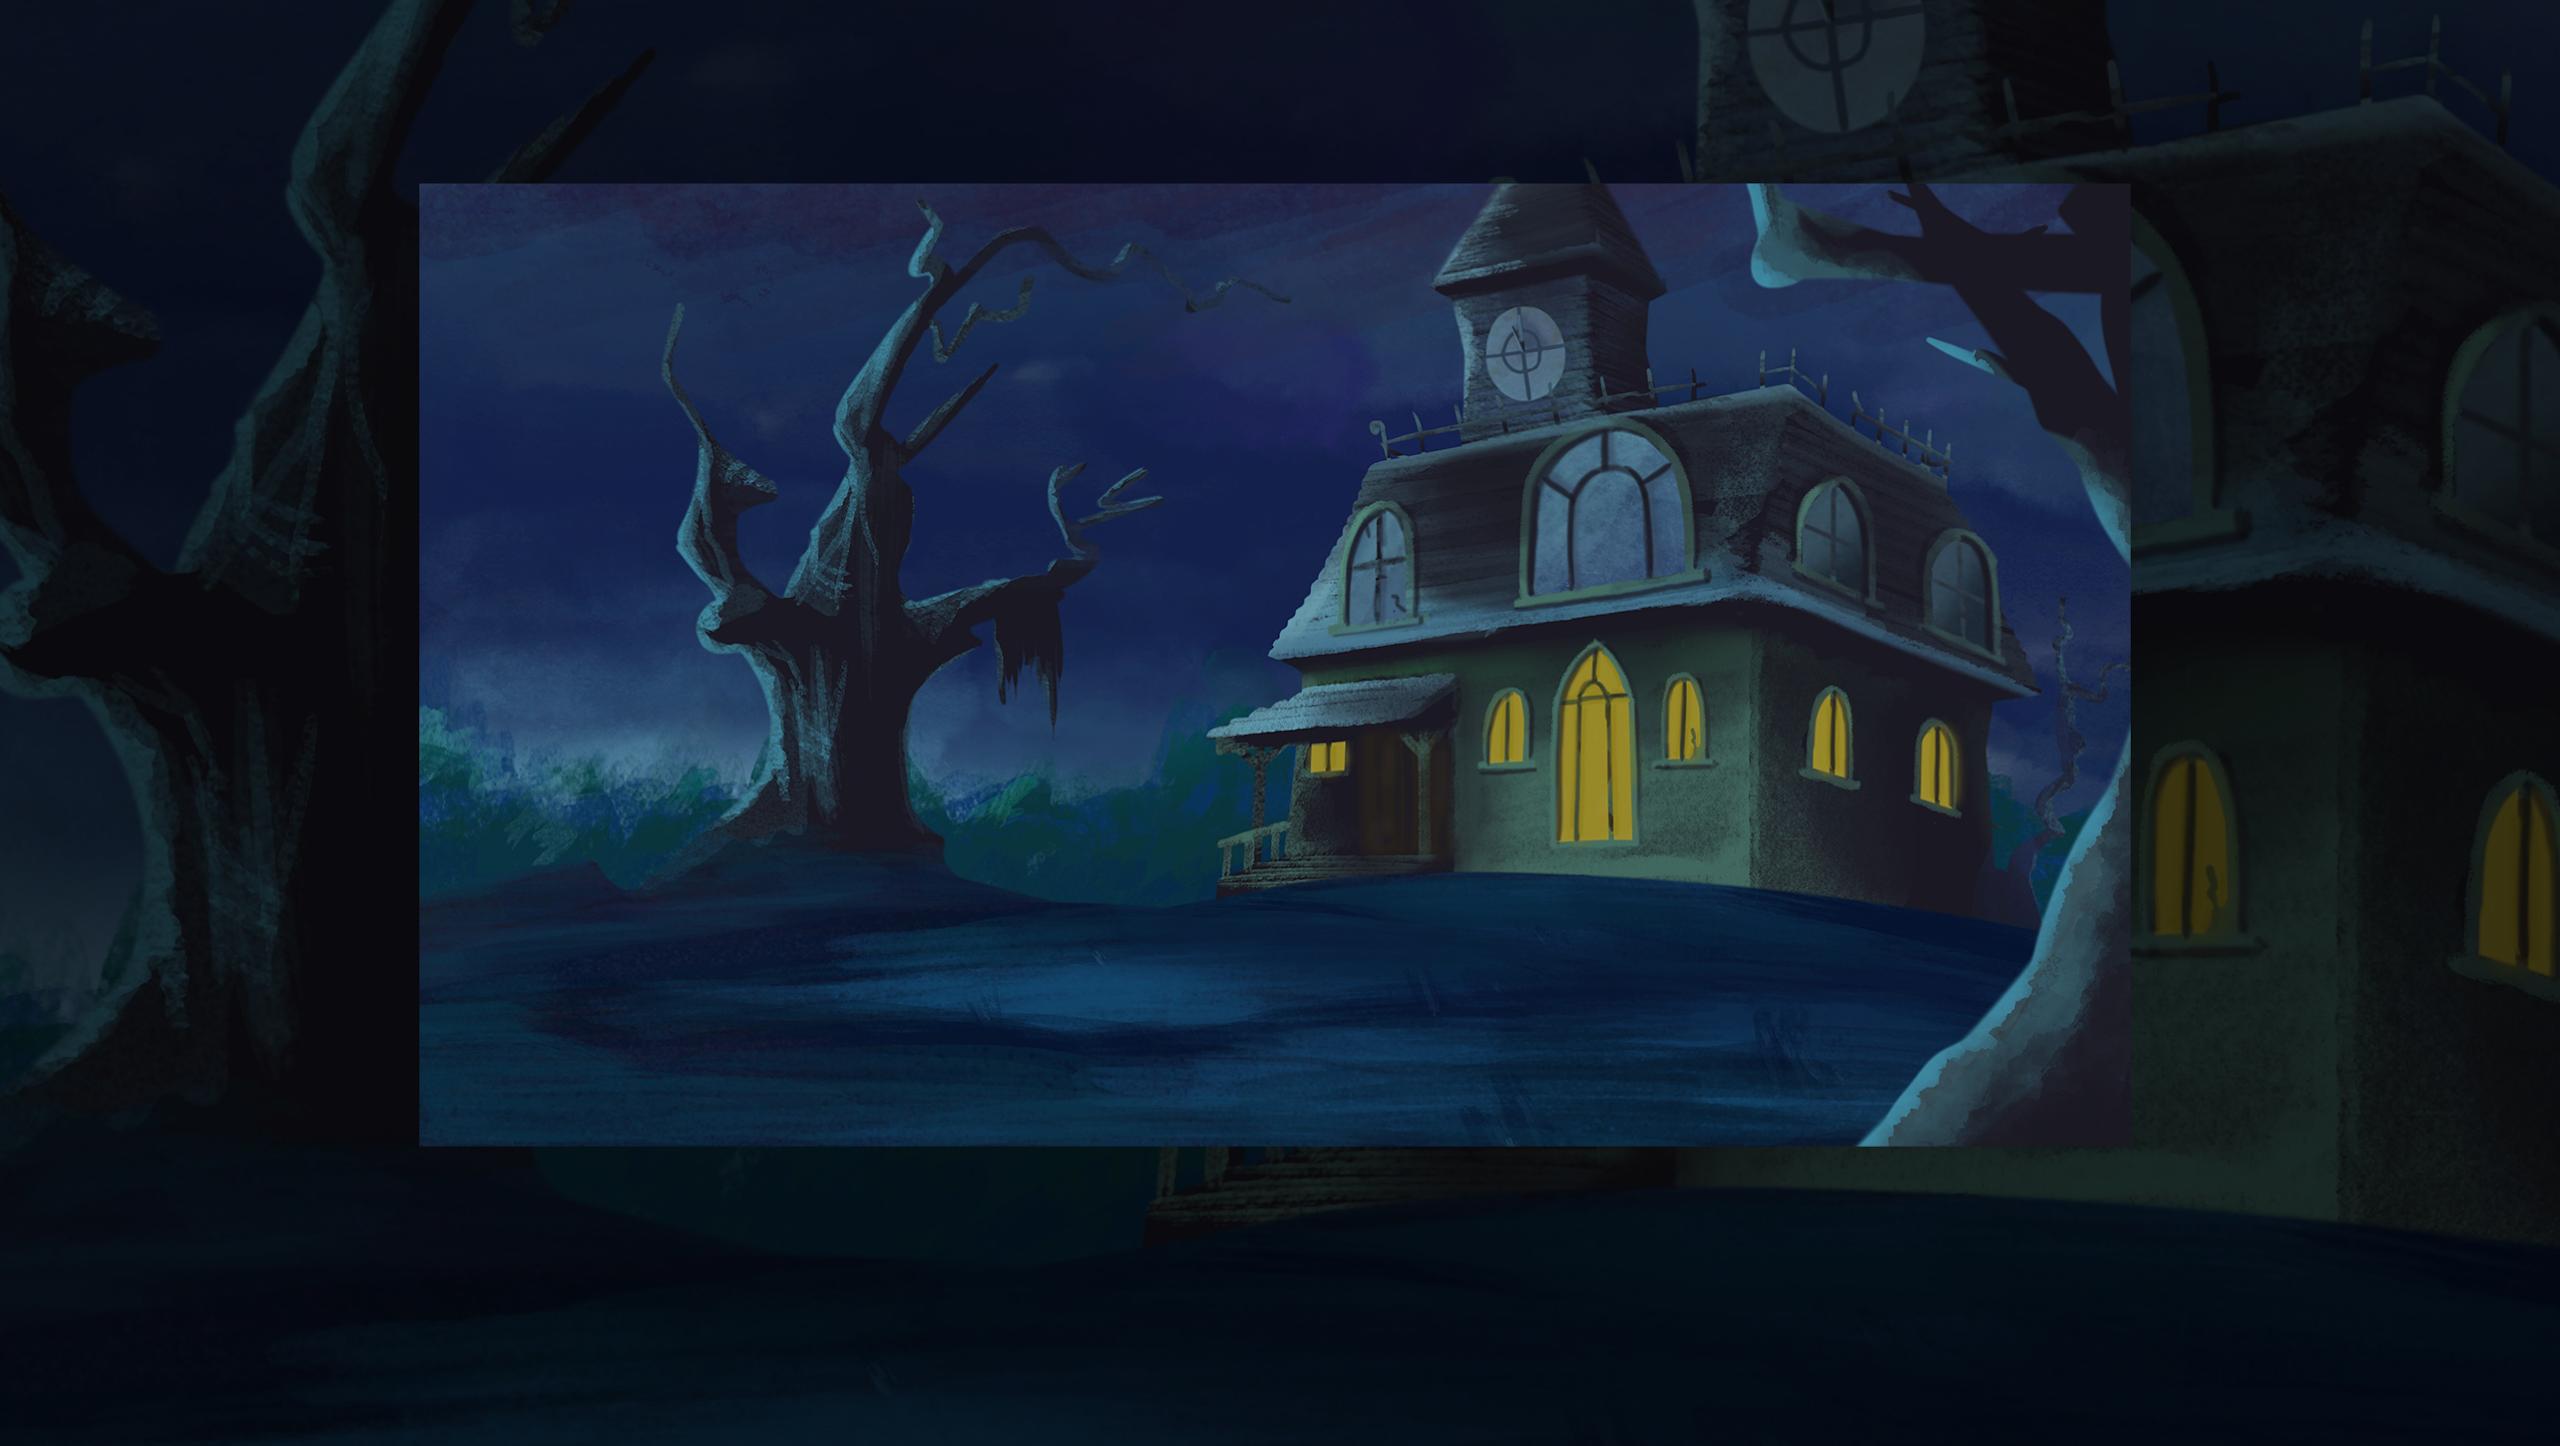 The SilvaGunner Spooktacular Halloween Horror Special: Part III